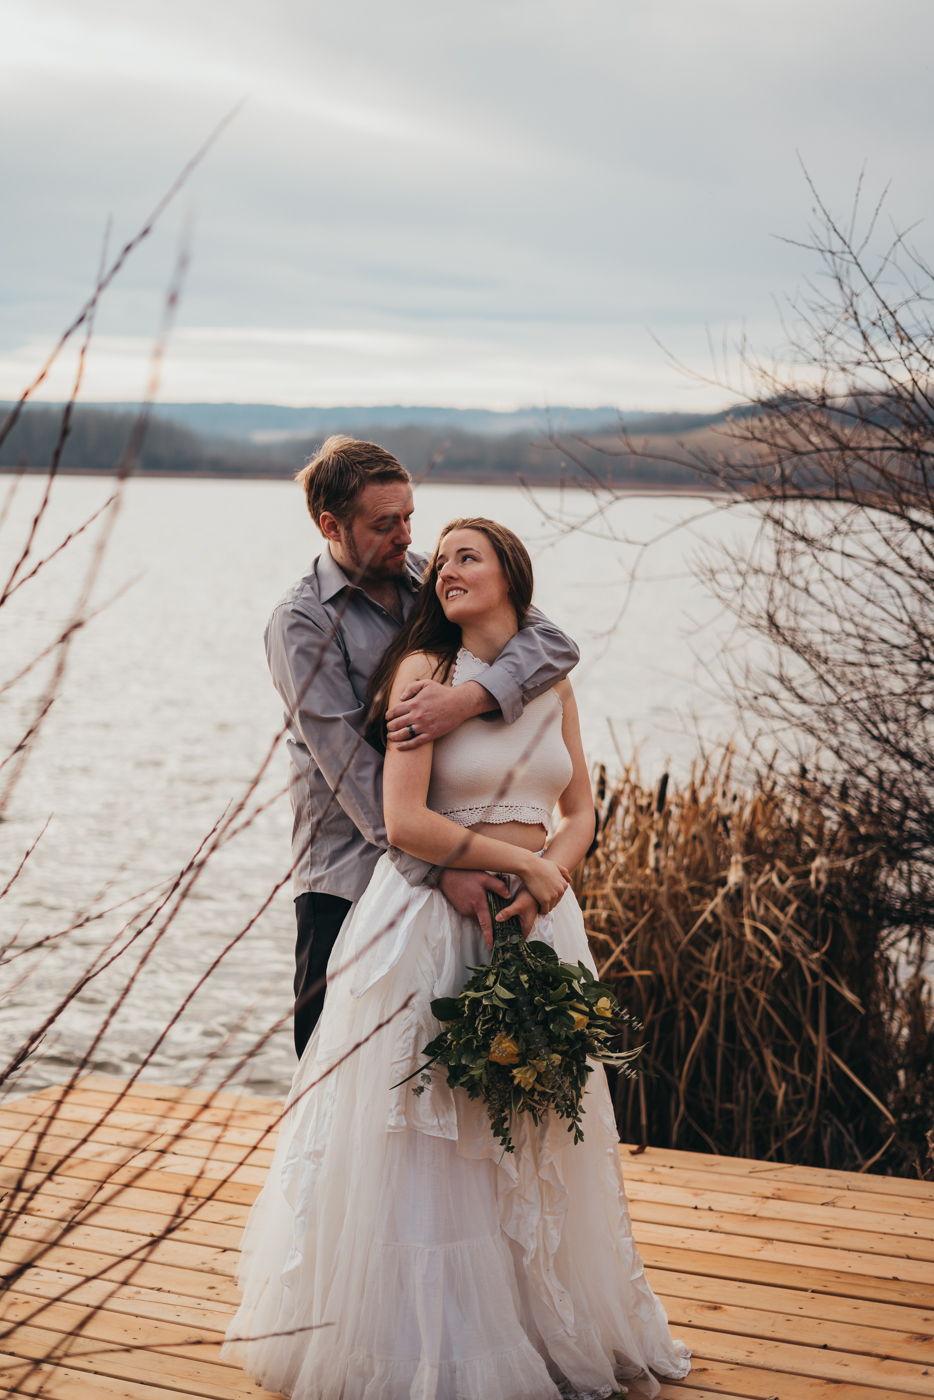 FortSt.John_photographer_TyraEPhotography_Wedding_Couple_Family_Photograhy_DawsonCreek_Elopement_Bride_Boduoir_Portraits-47.jpg